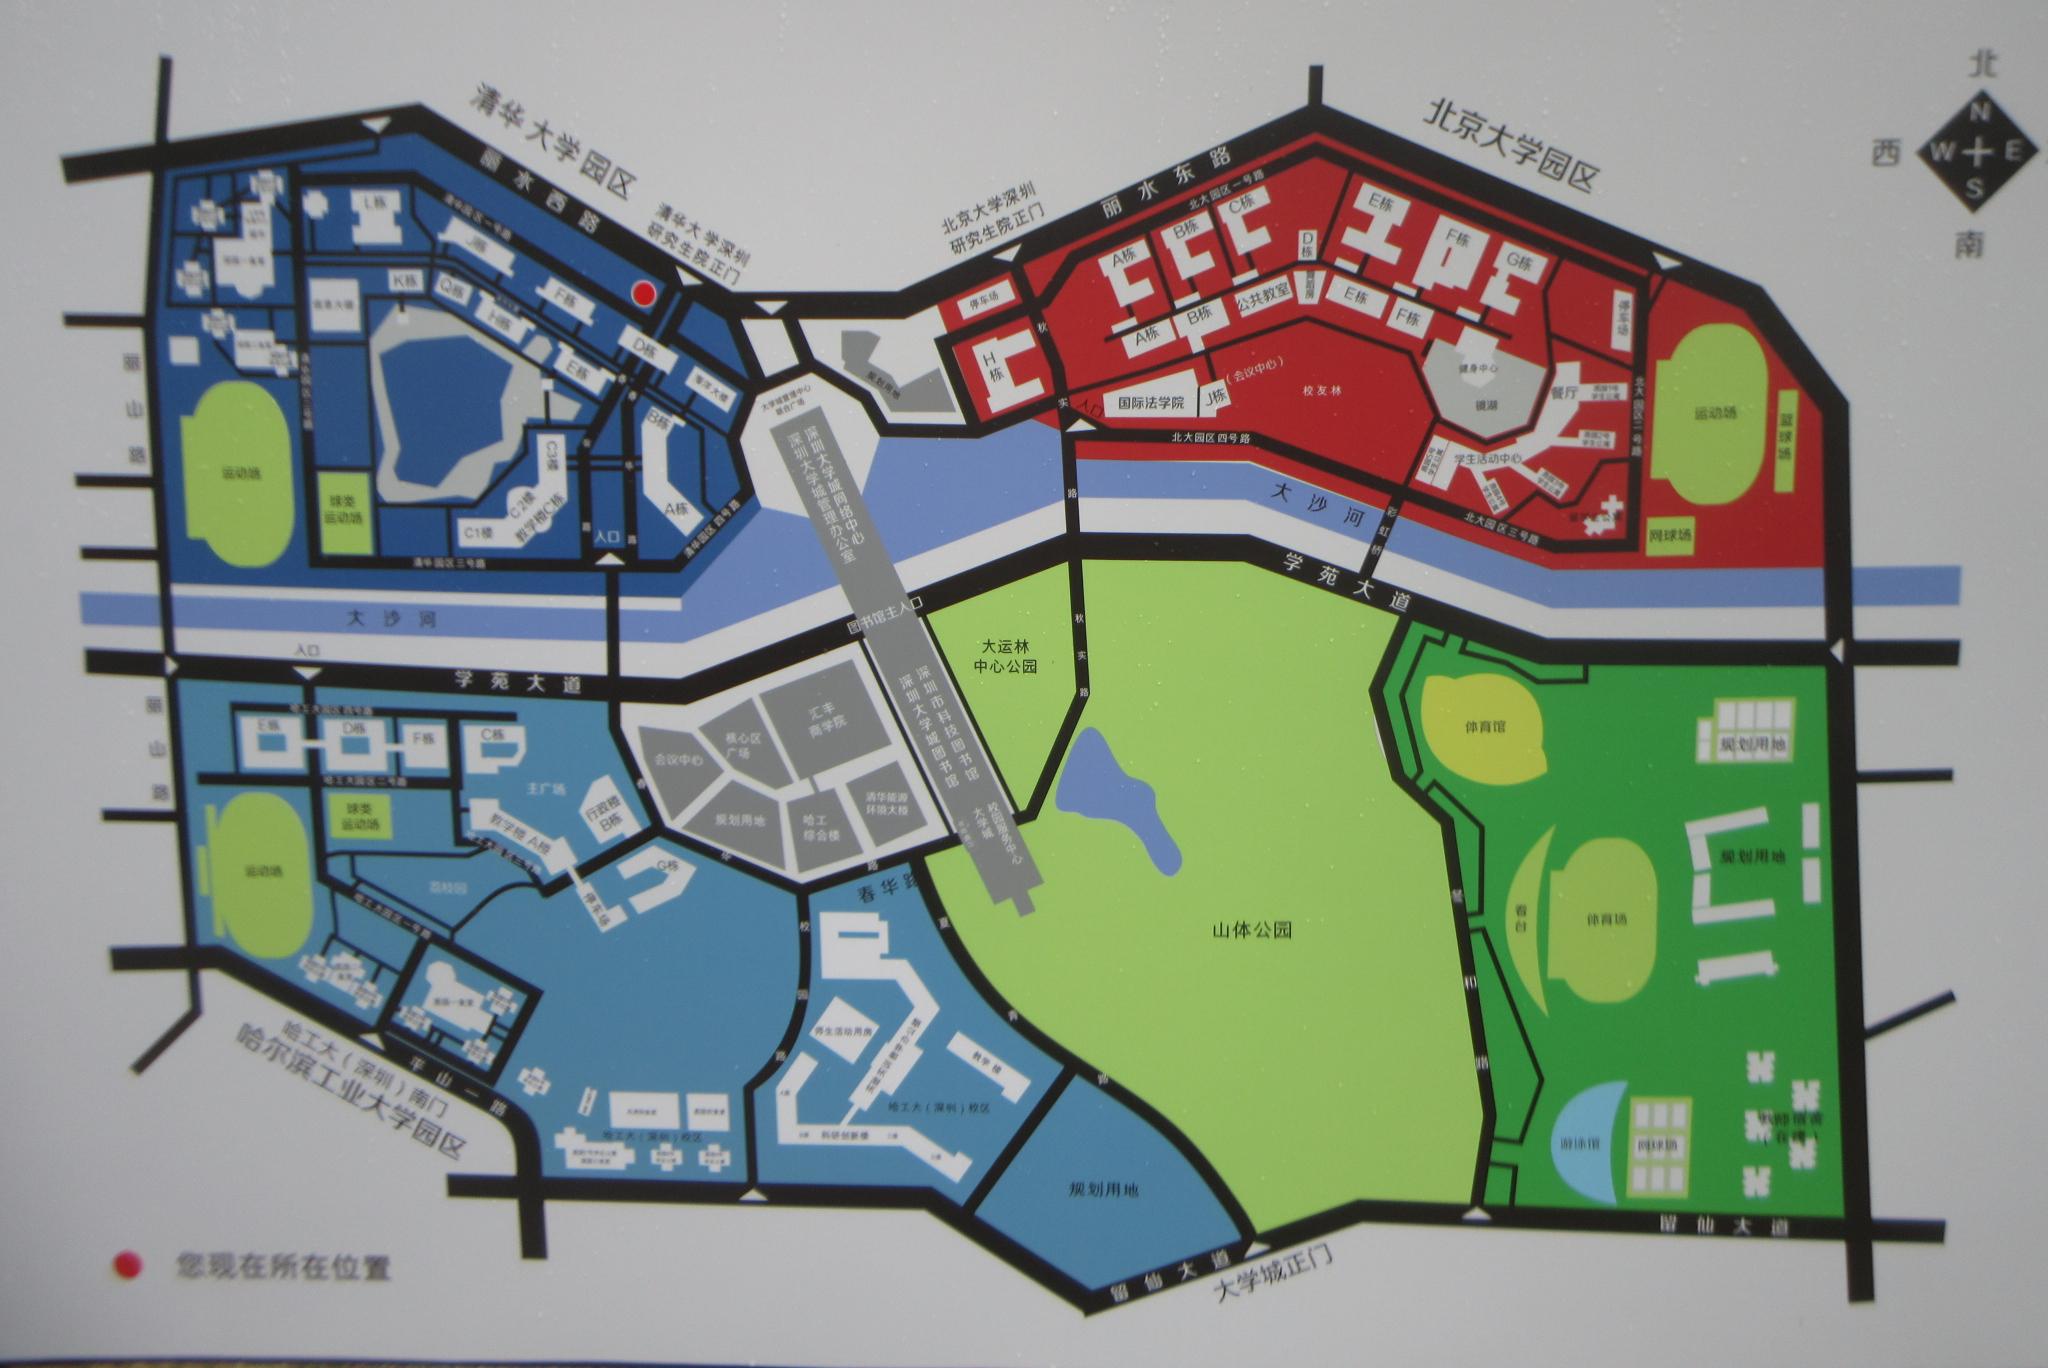 Tsinghua University Campus Map.File Sz Shenzhen 南山 Nanshan 春華路 Chunhua Road 清華大學 深圳